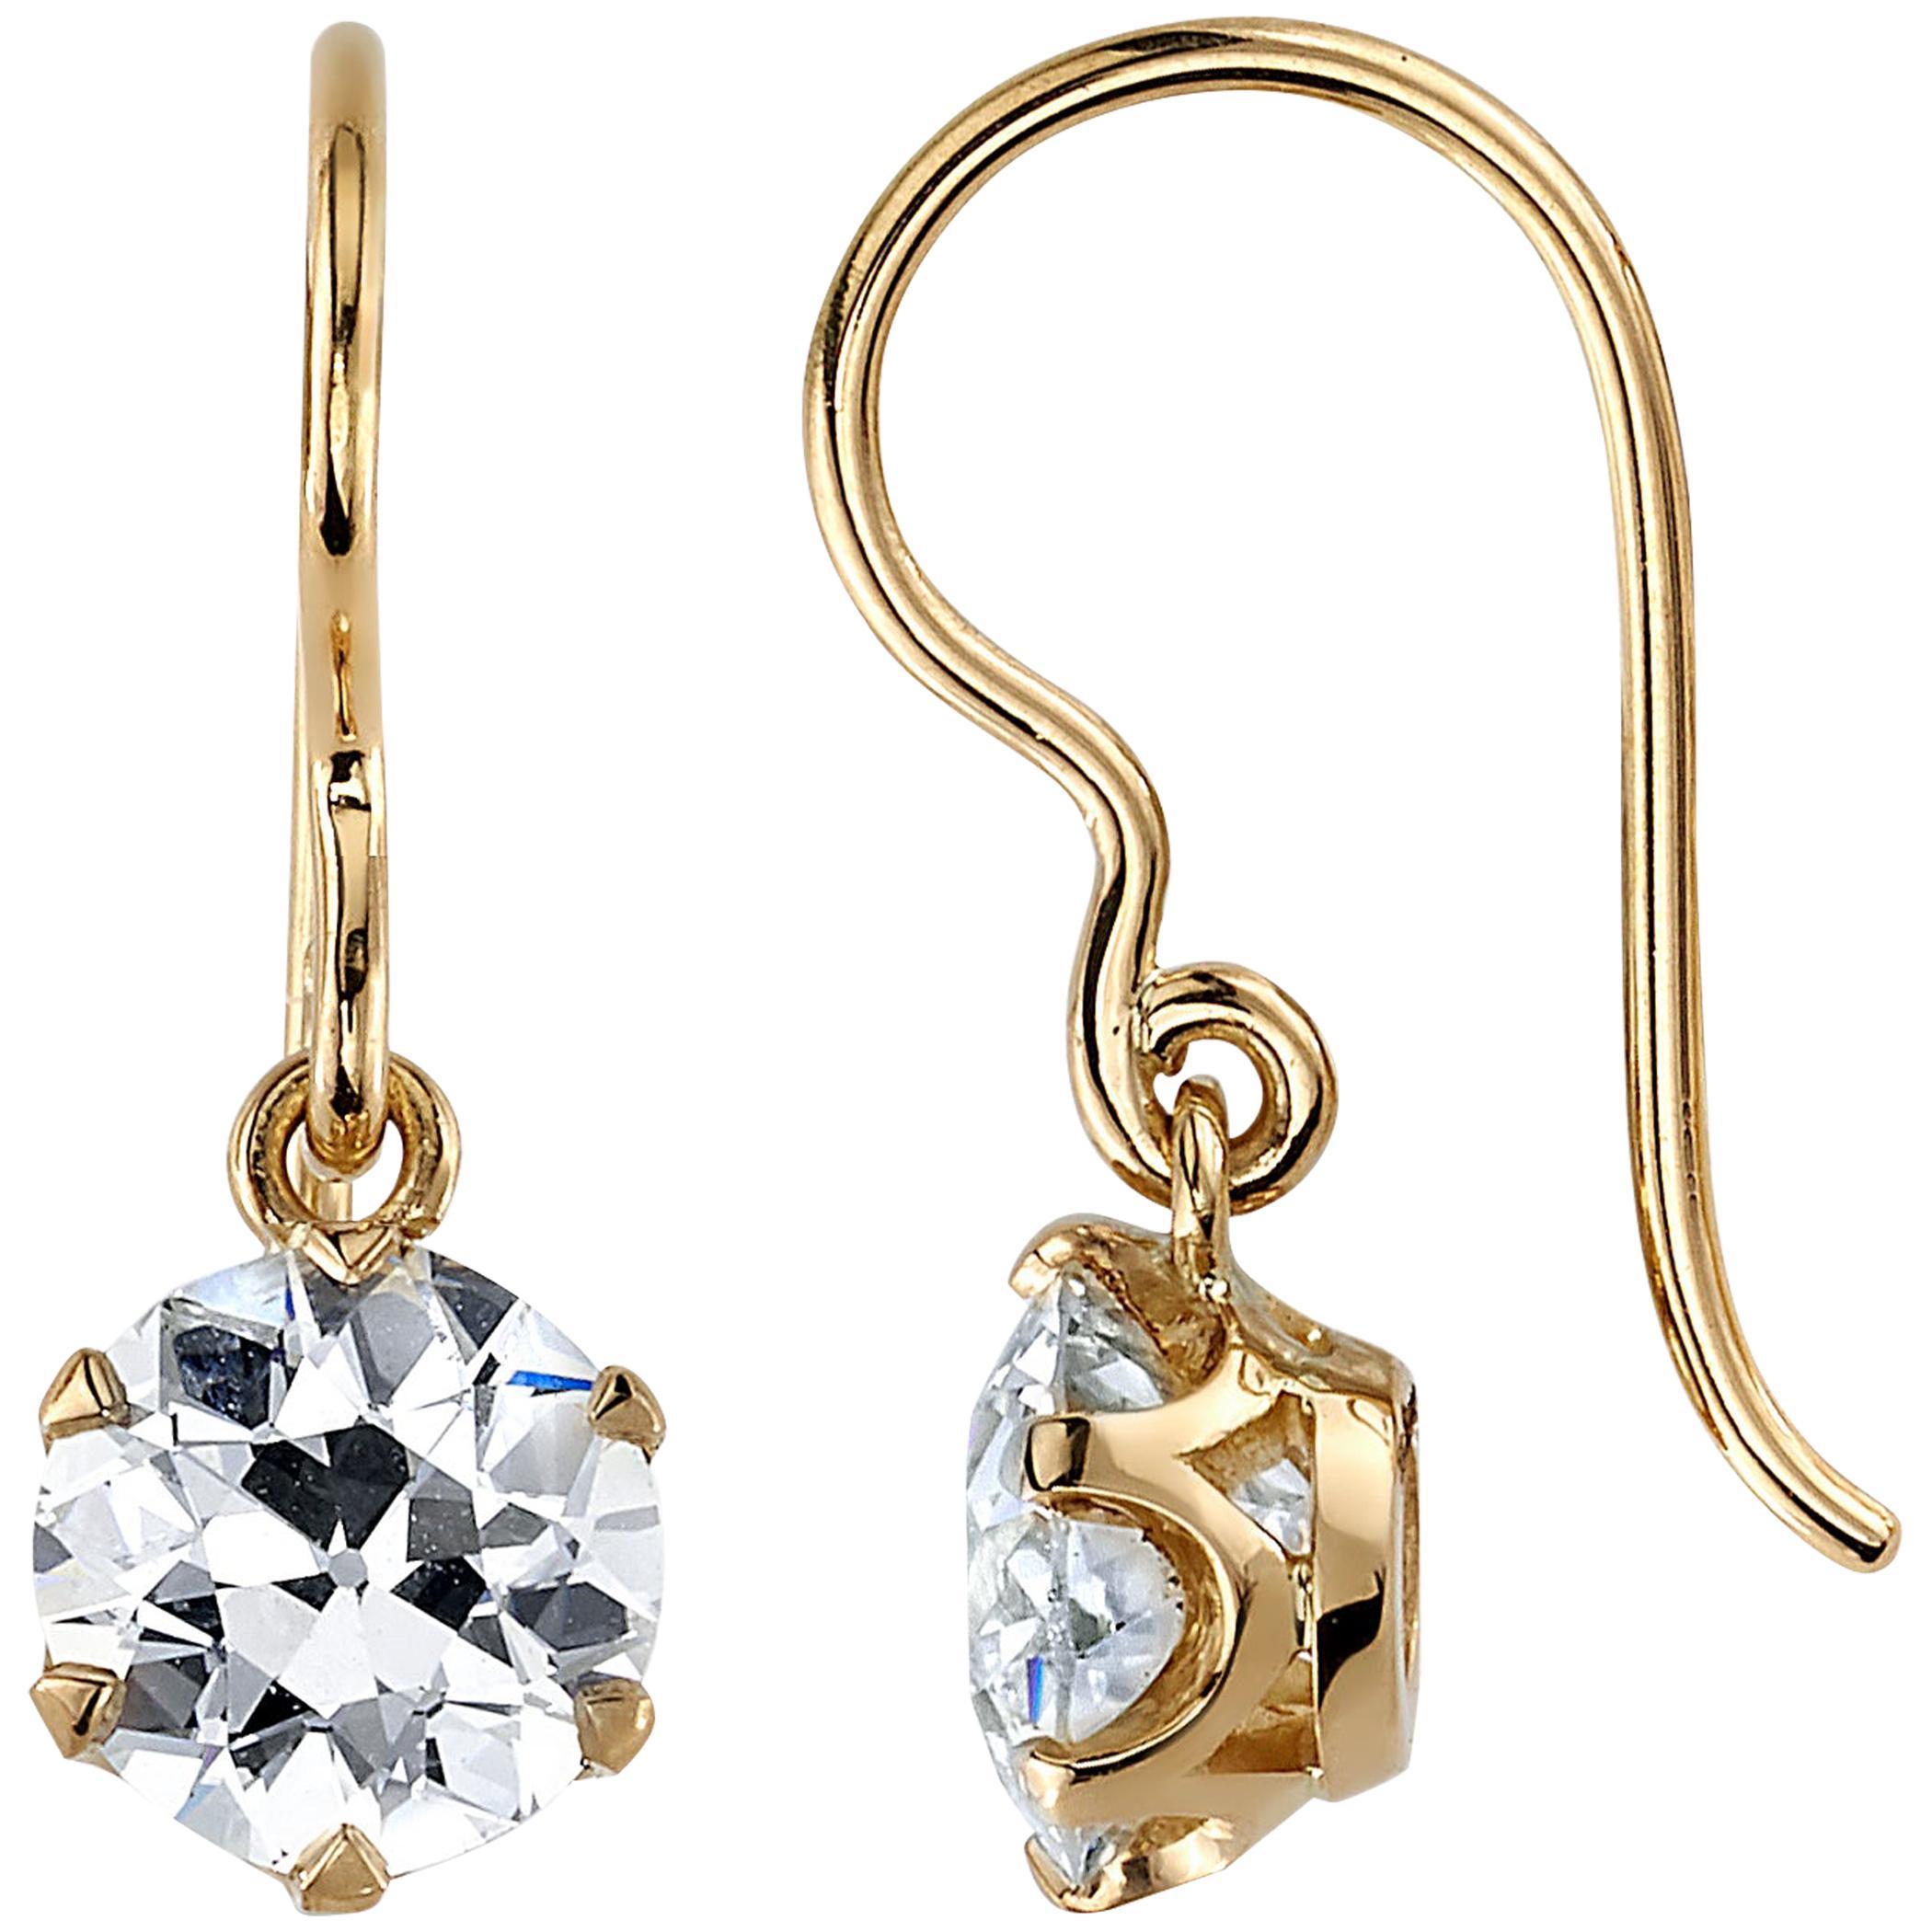 Handcrafted Gia Old European Cut Diamond Drop Earrings by Single Stone